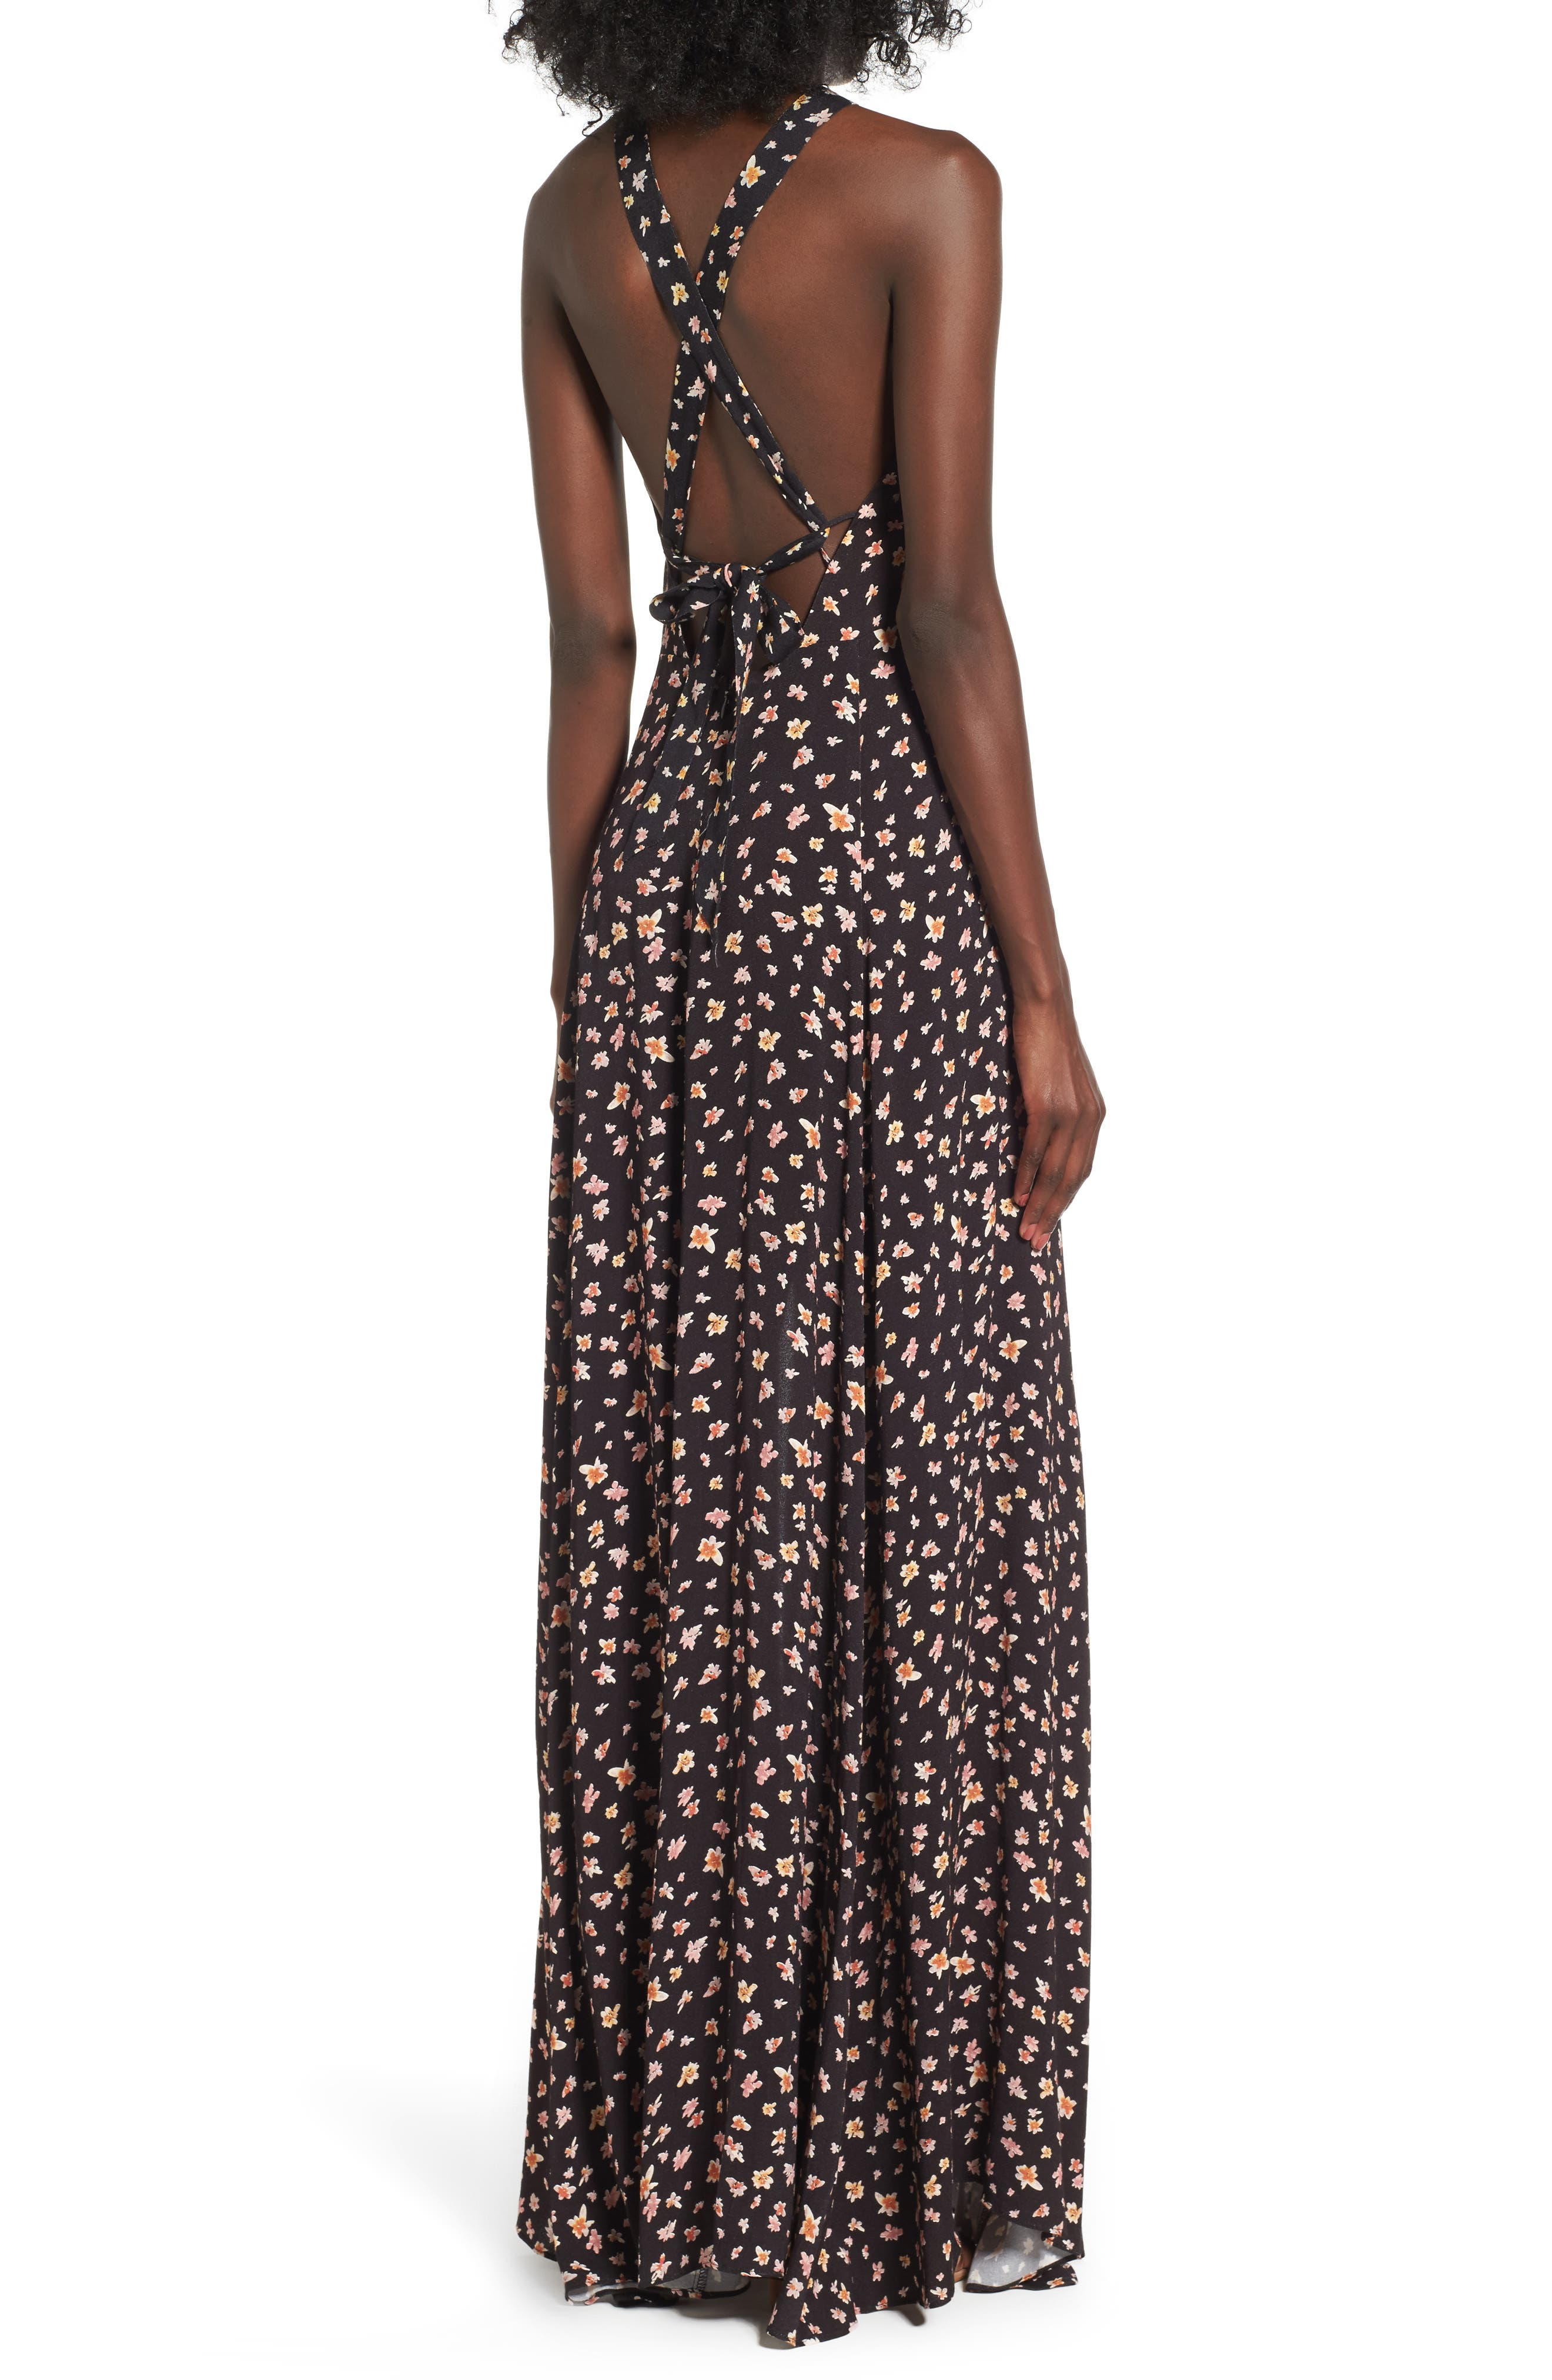 Harlean Halter Maxi Dress,                             Alternate thumbnail 2, color,                             010